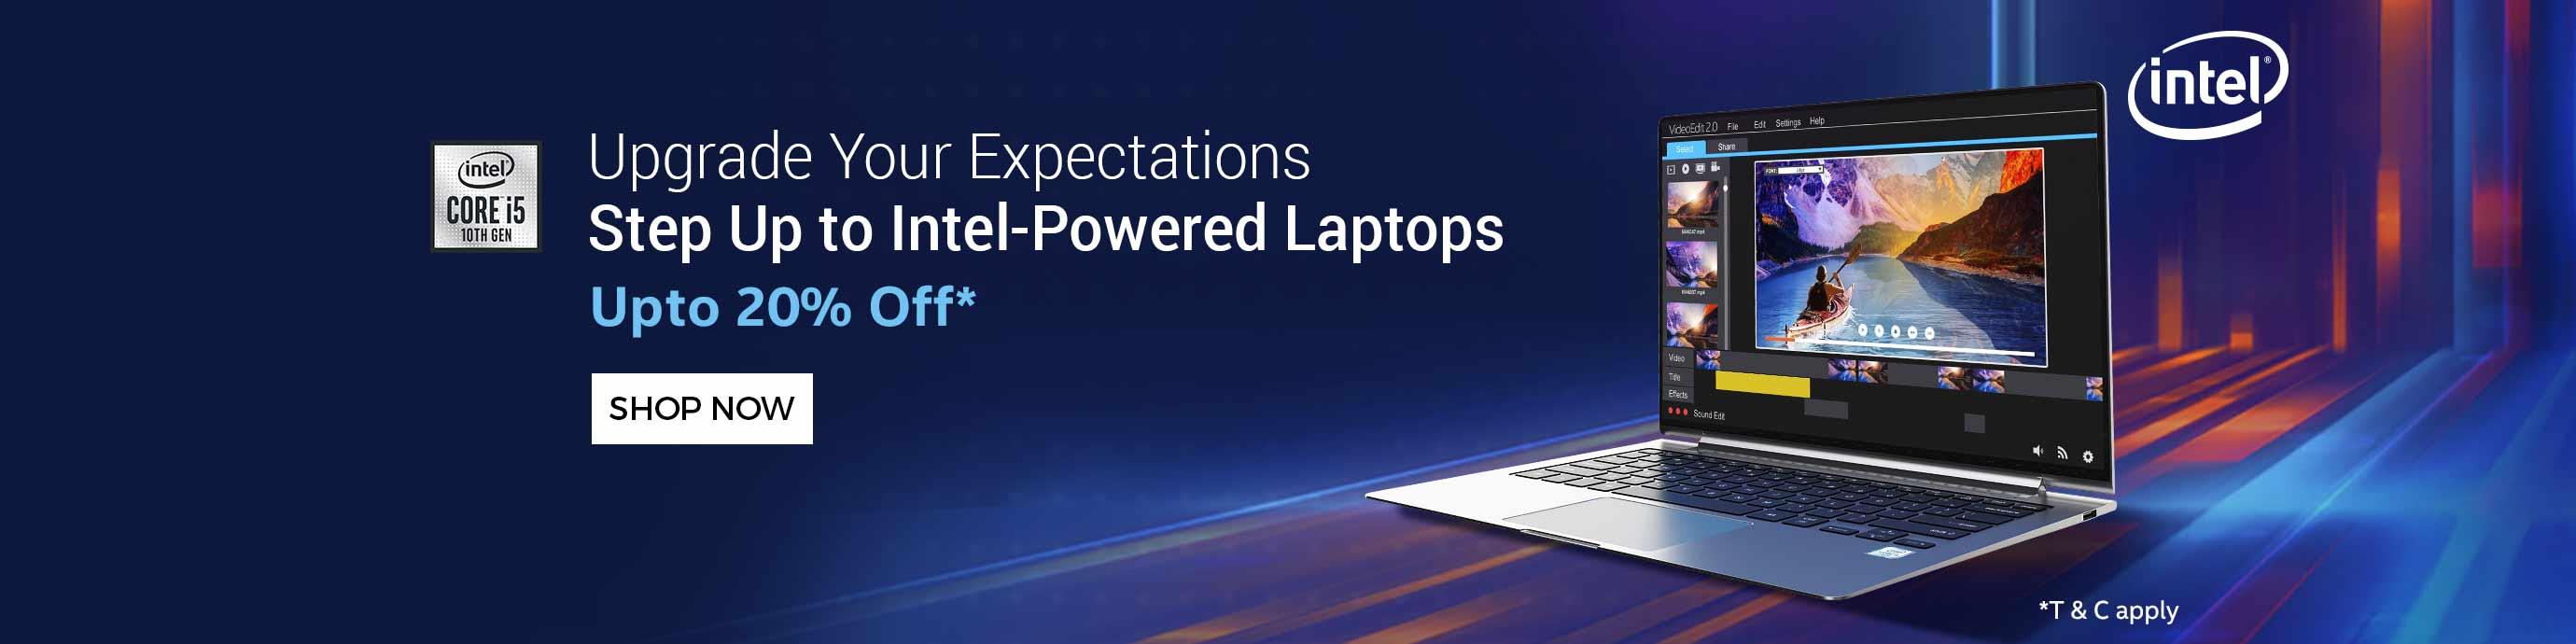 ShopClues.com - Get Upto 20% Discount on laptops